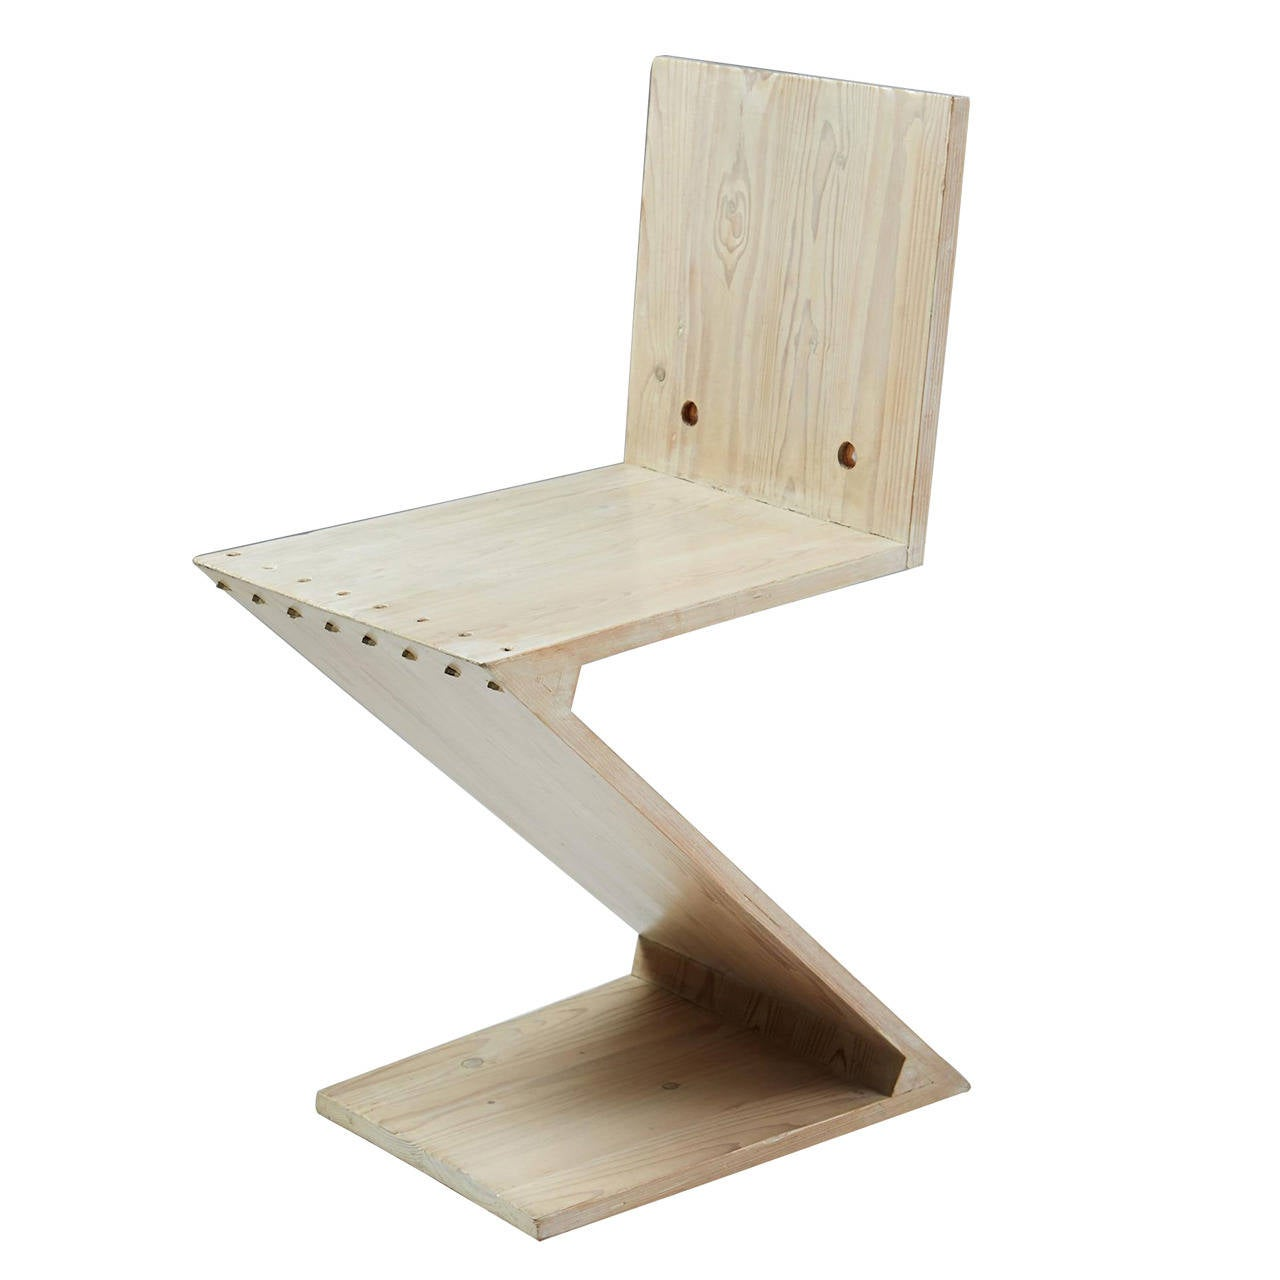 Zig Zag Chair Designed by Gerrit Rietveld for G.A. van de Groenekan, Holland